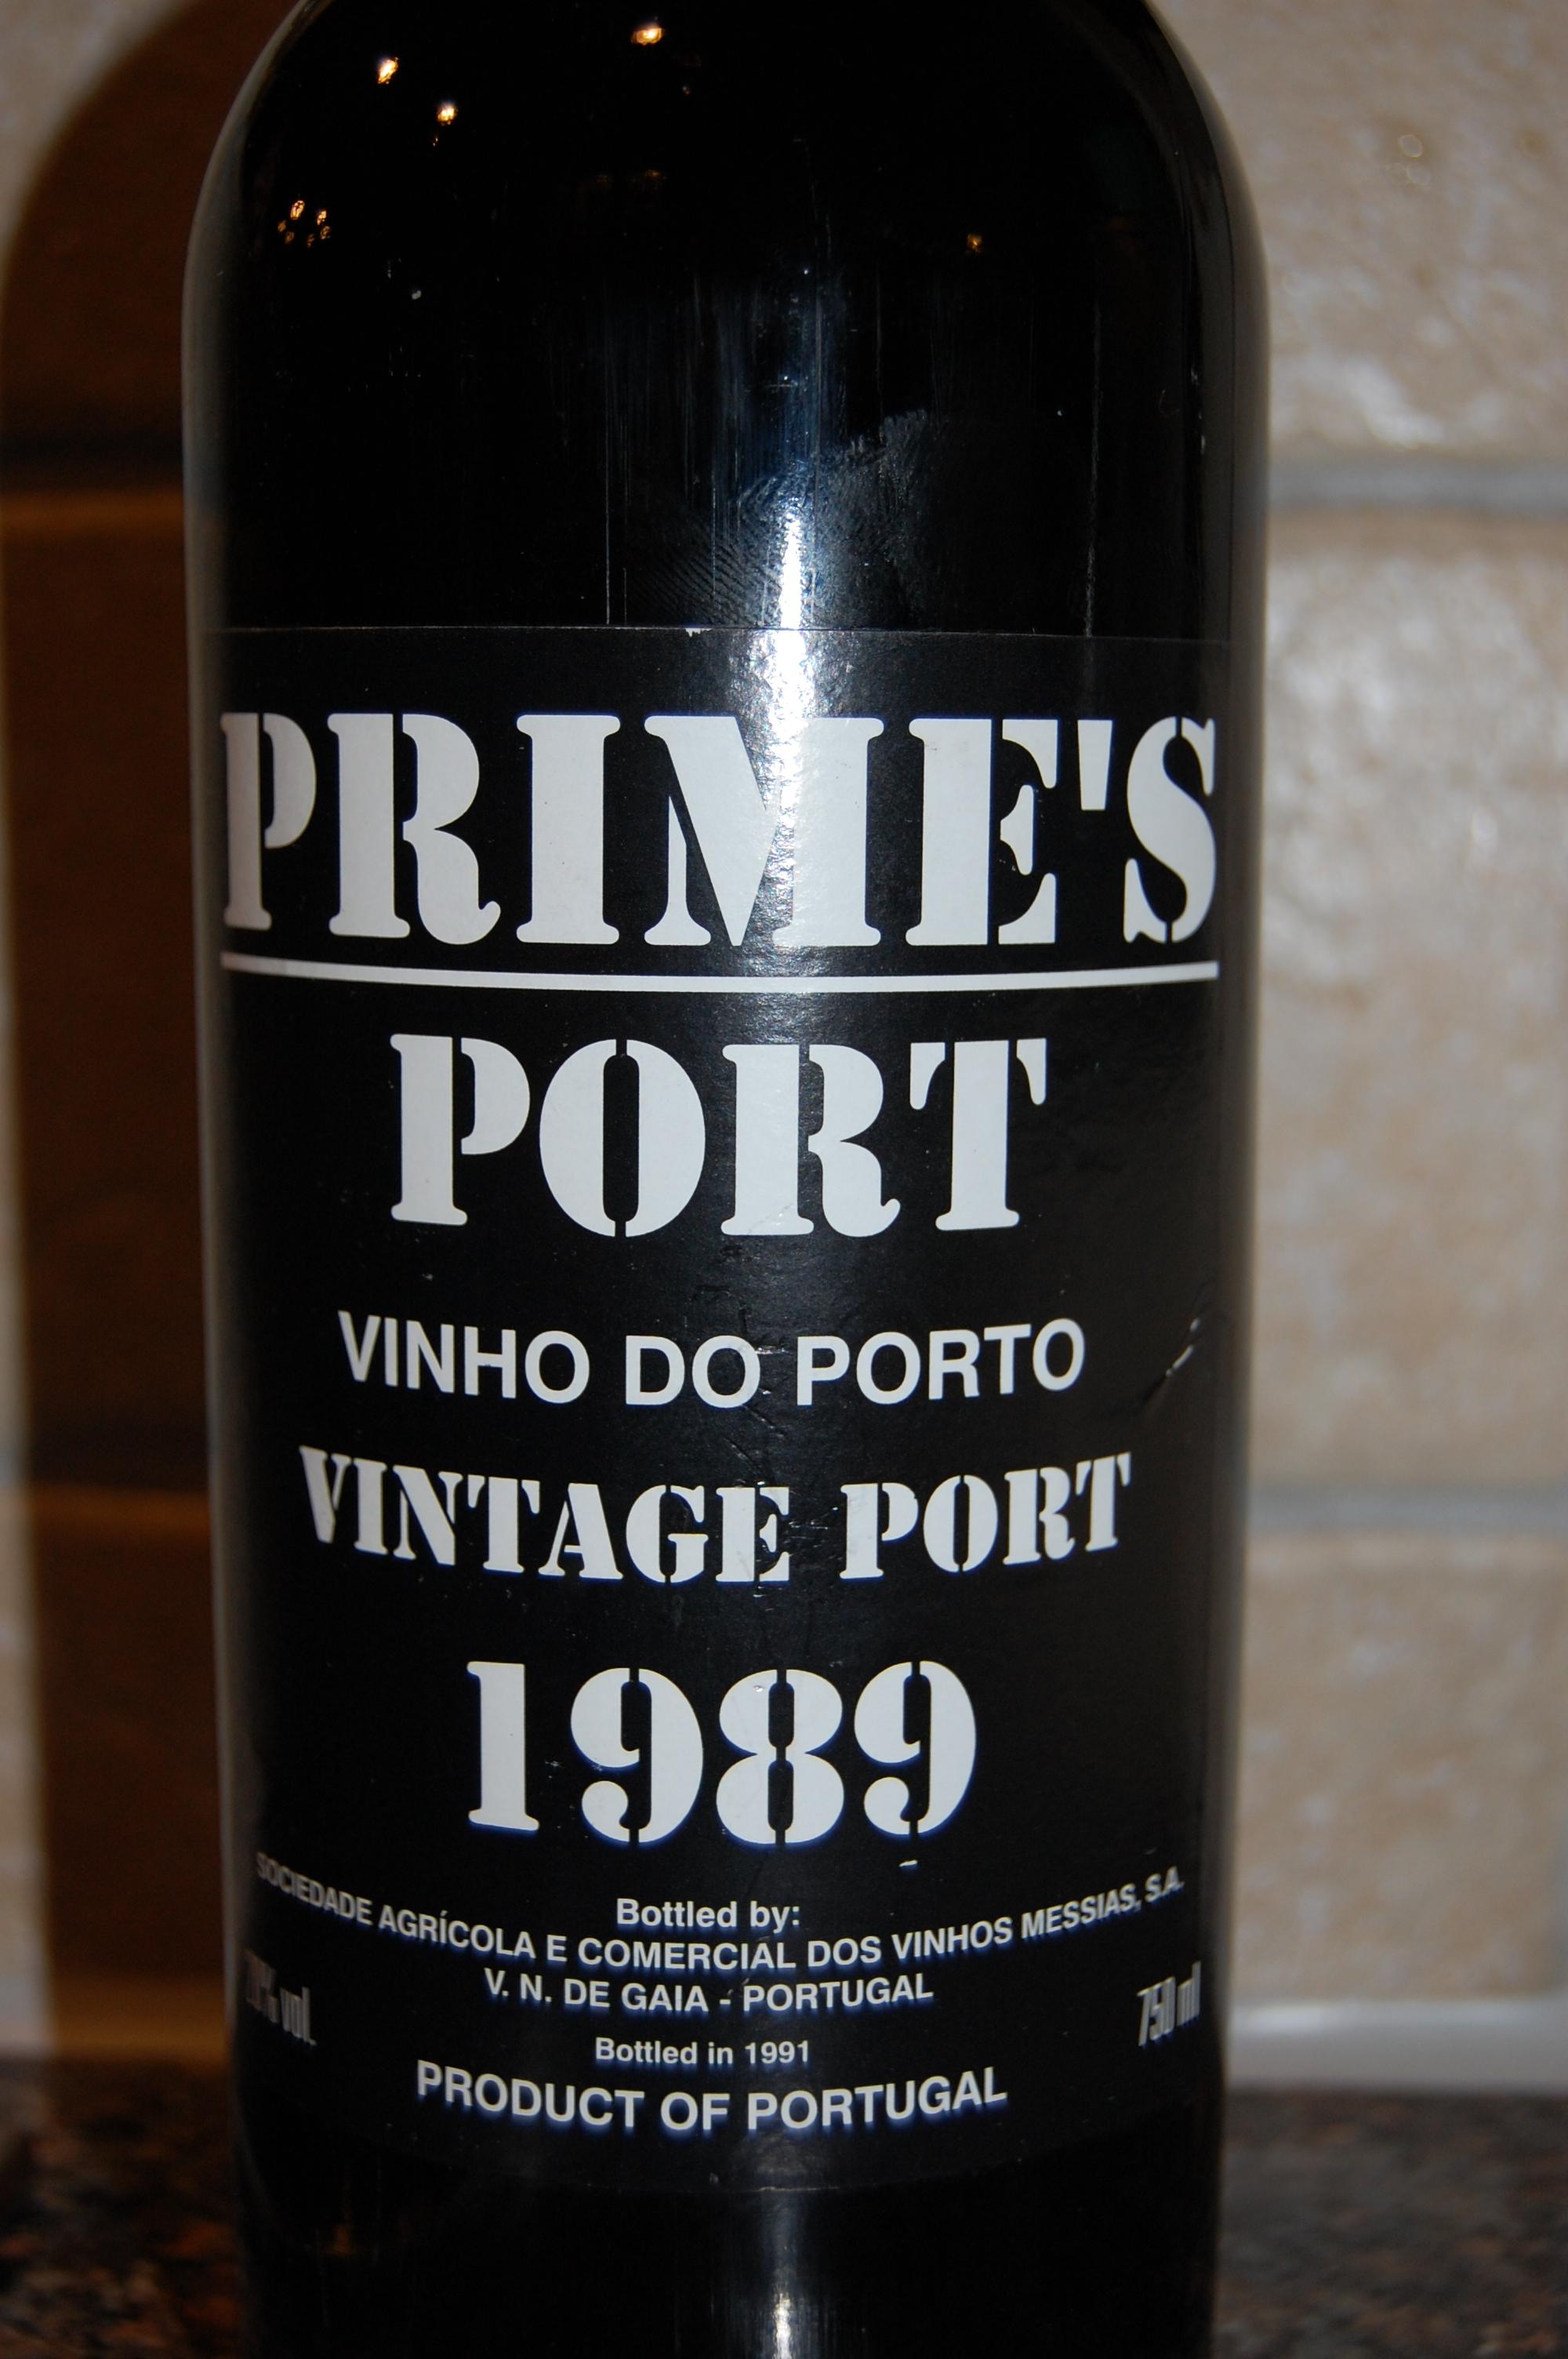 Primes vintage 89